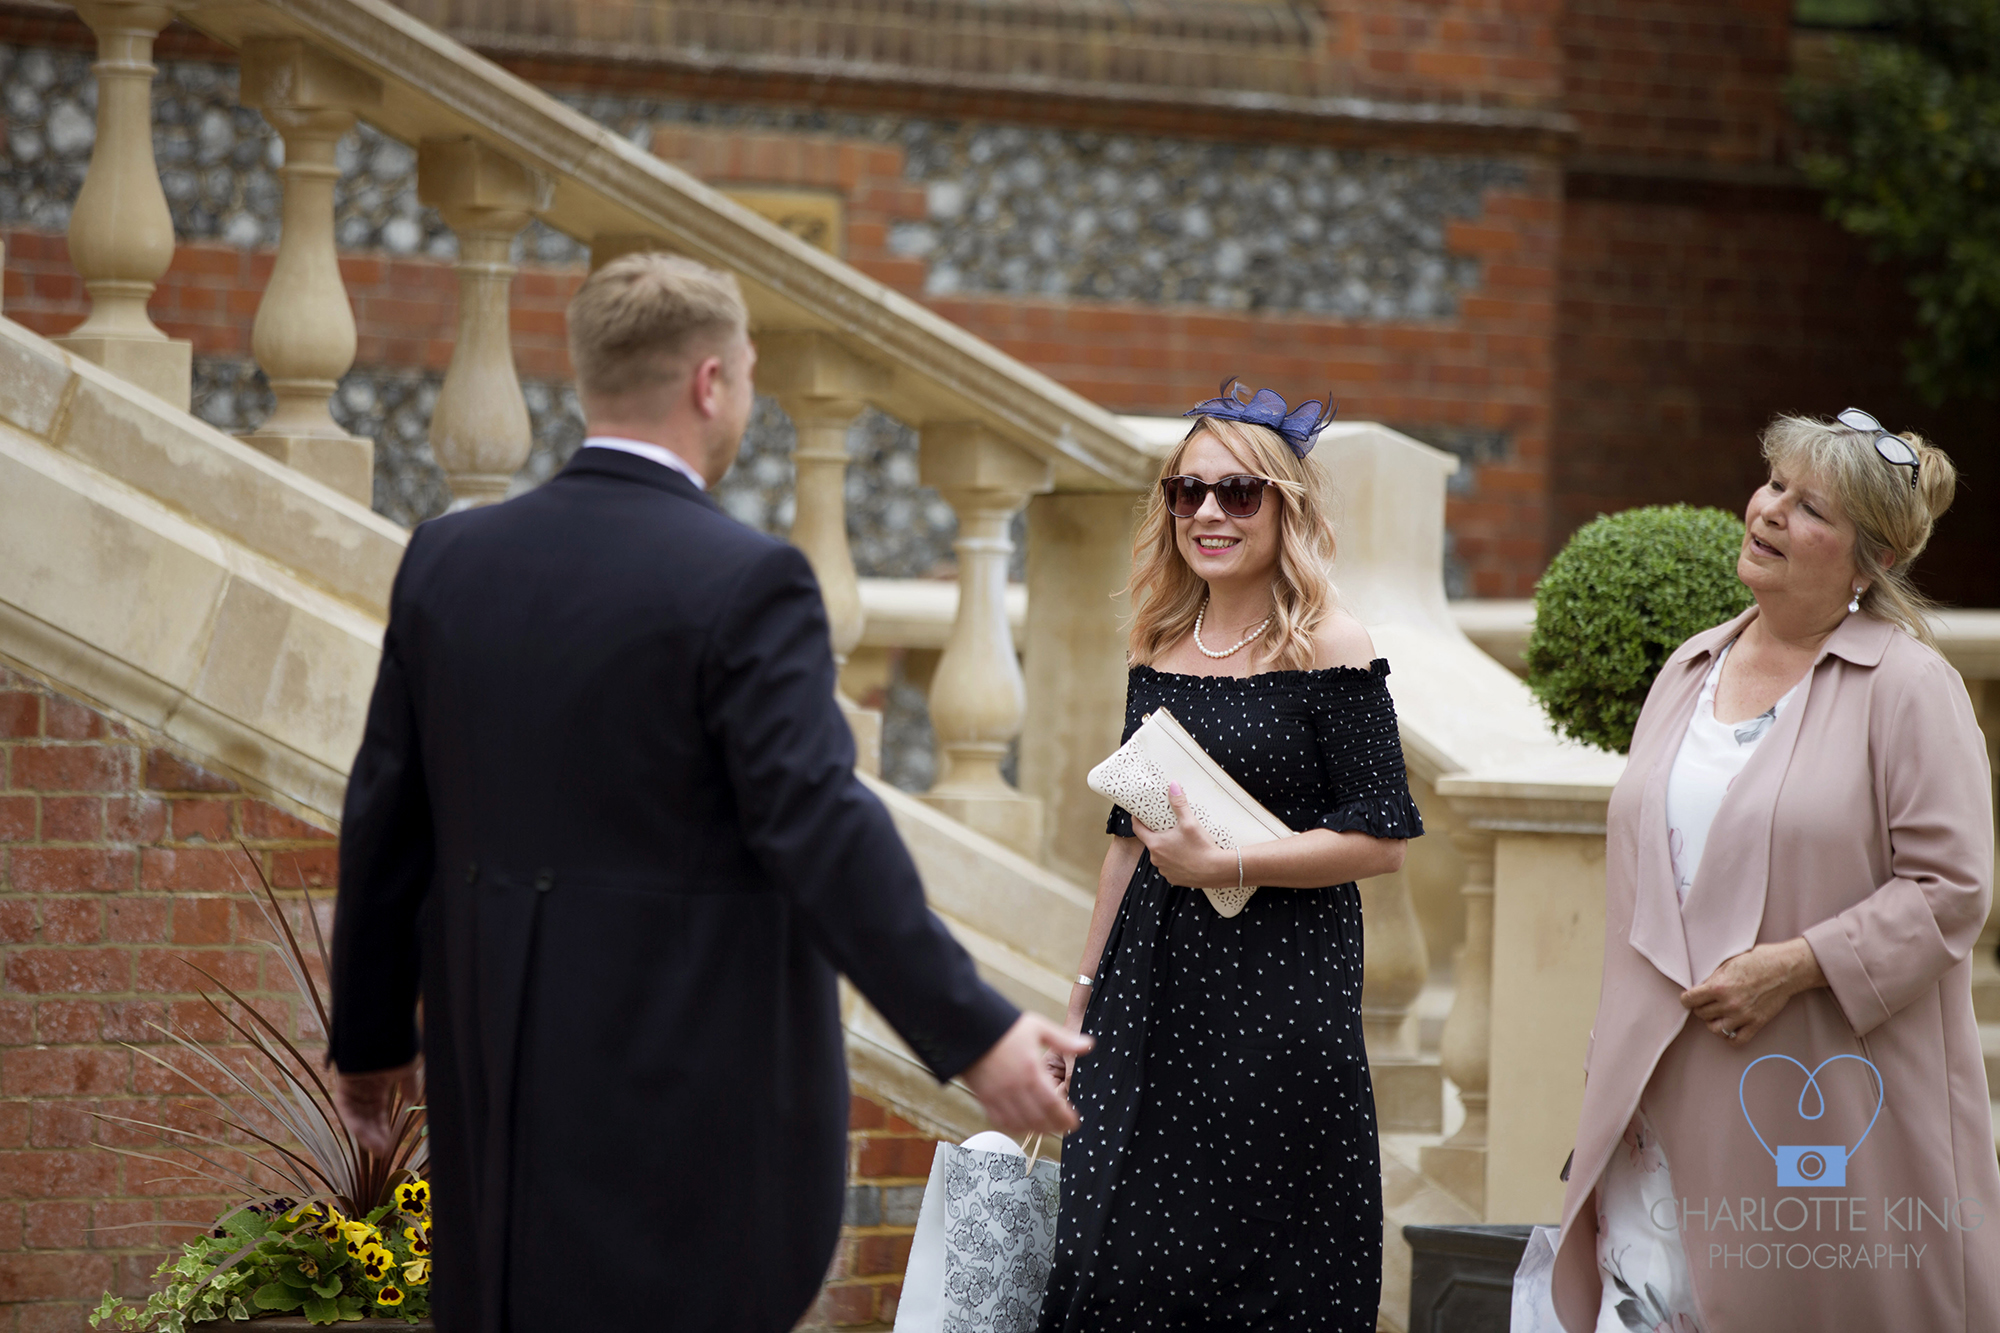 Woldingham-school-wedding-charlotte-king-photography (27)